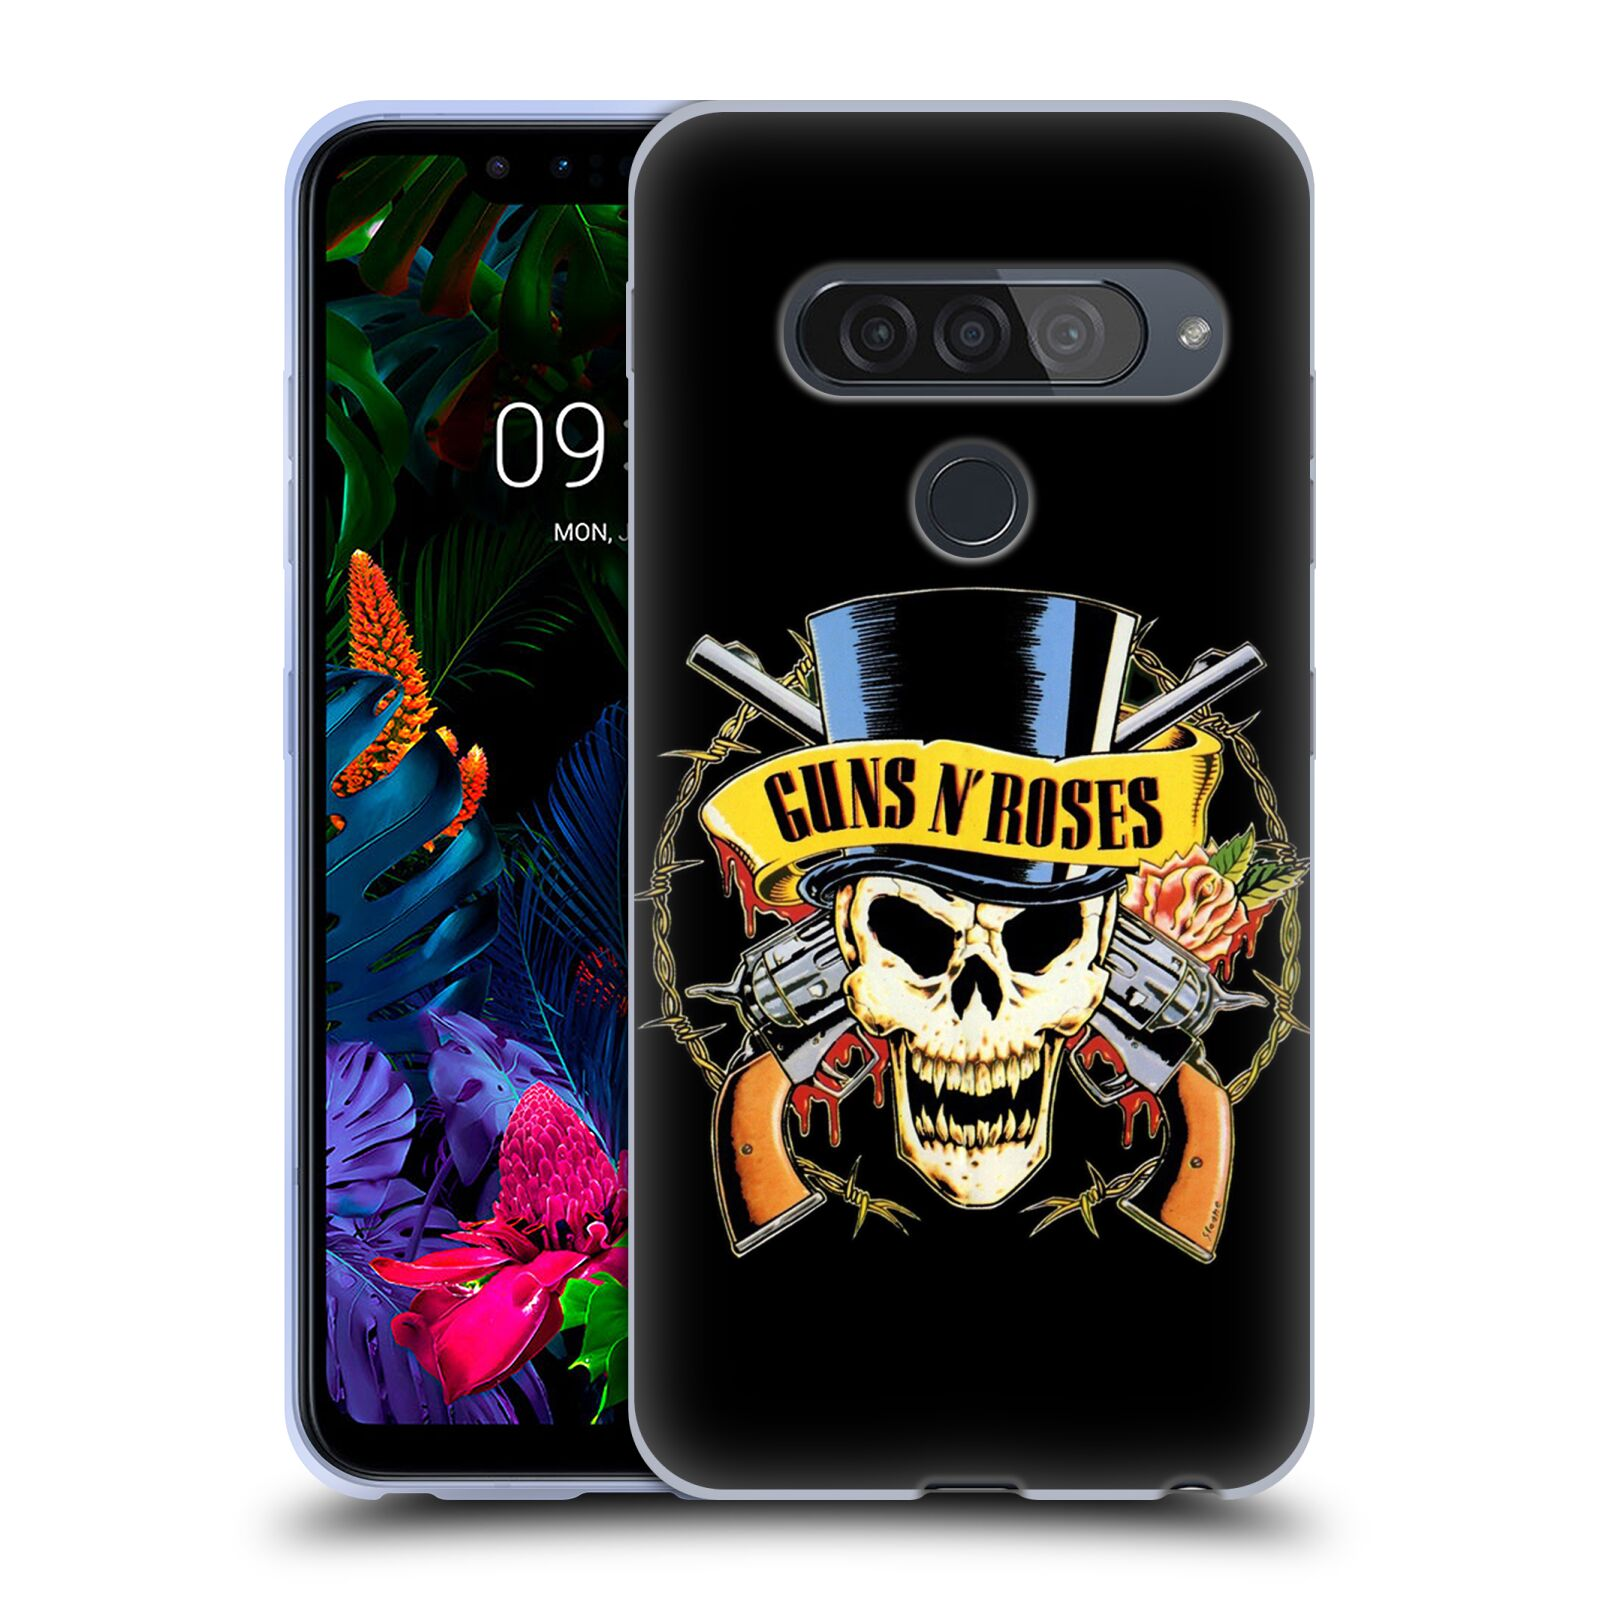 Silikonové pouzdro na mobil LG G8s ThinQ - Head Case - Guns N' Roses - Lebka